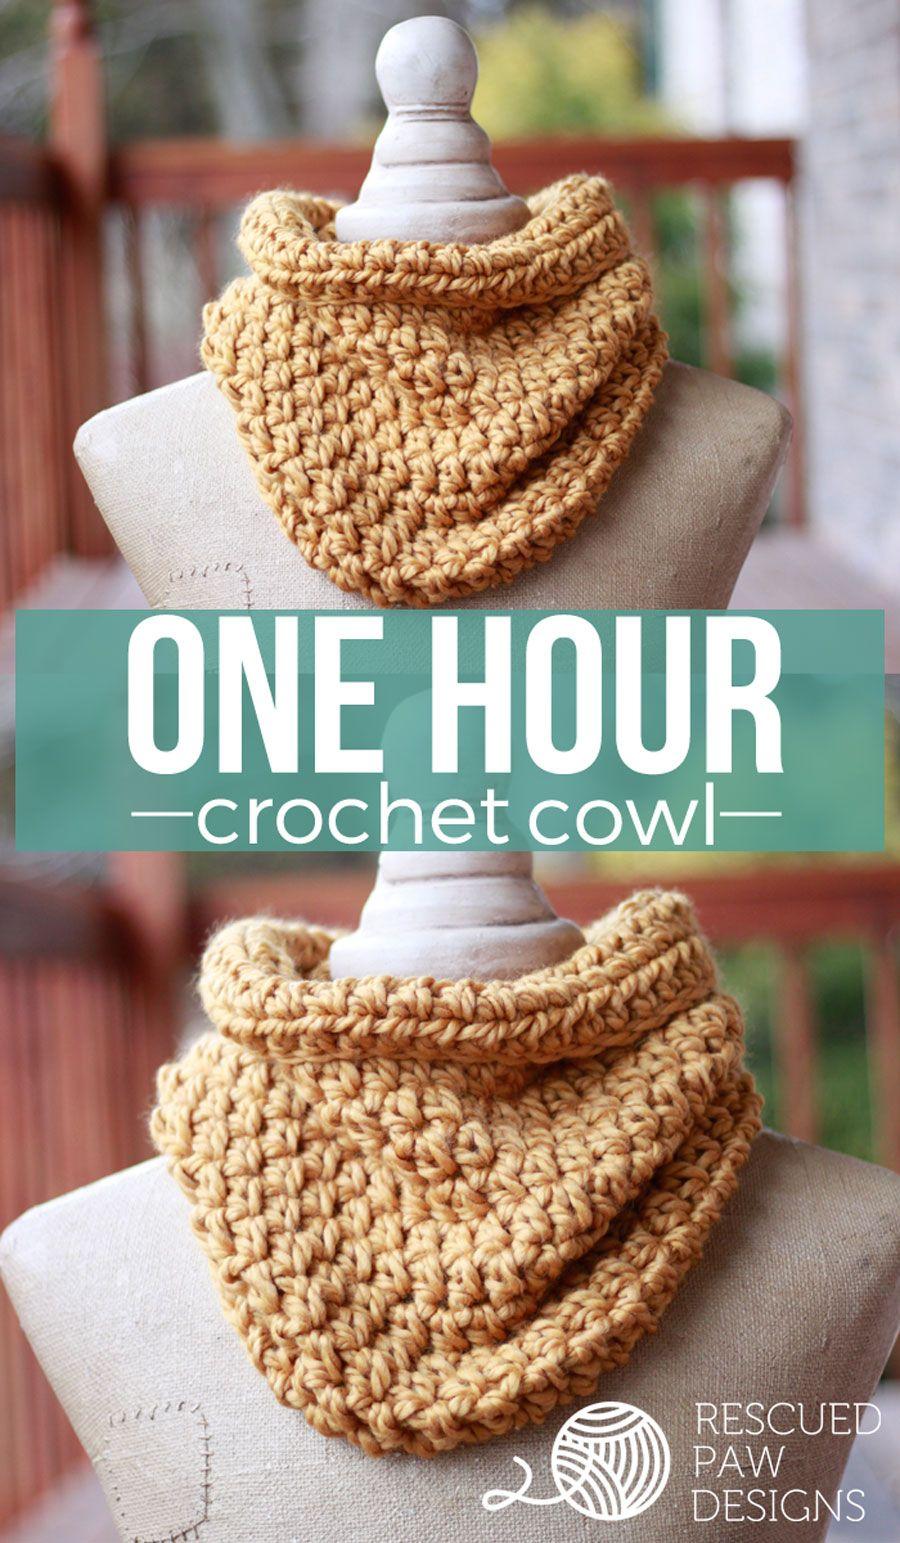 One Hour Crochet Cowl | Tejido, Gorros y Bricolaje